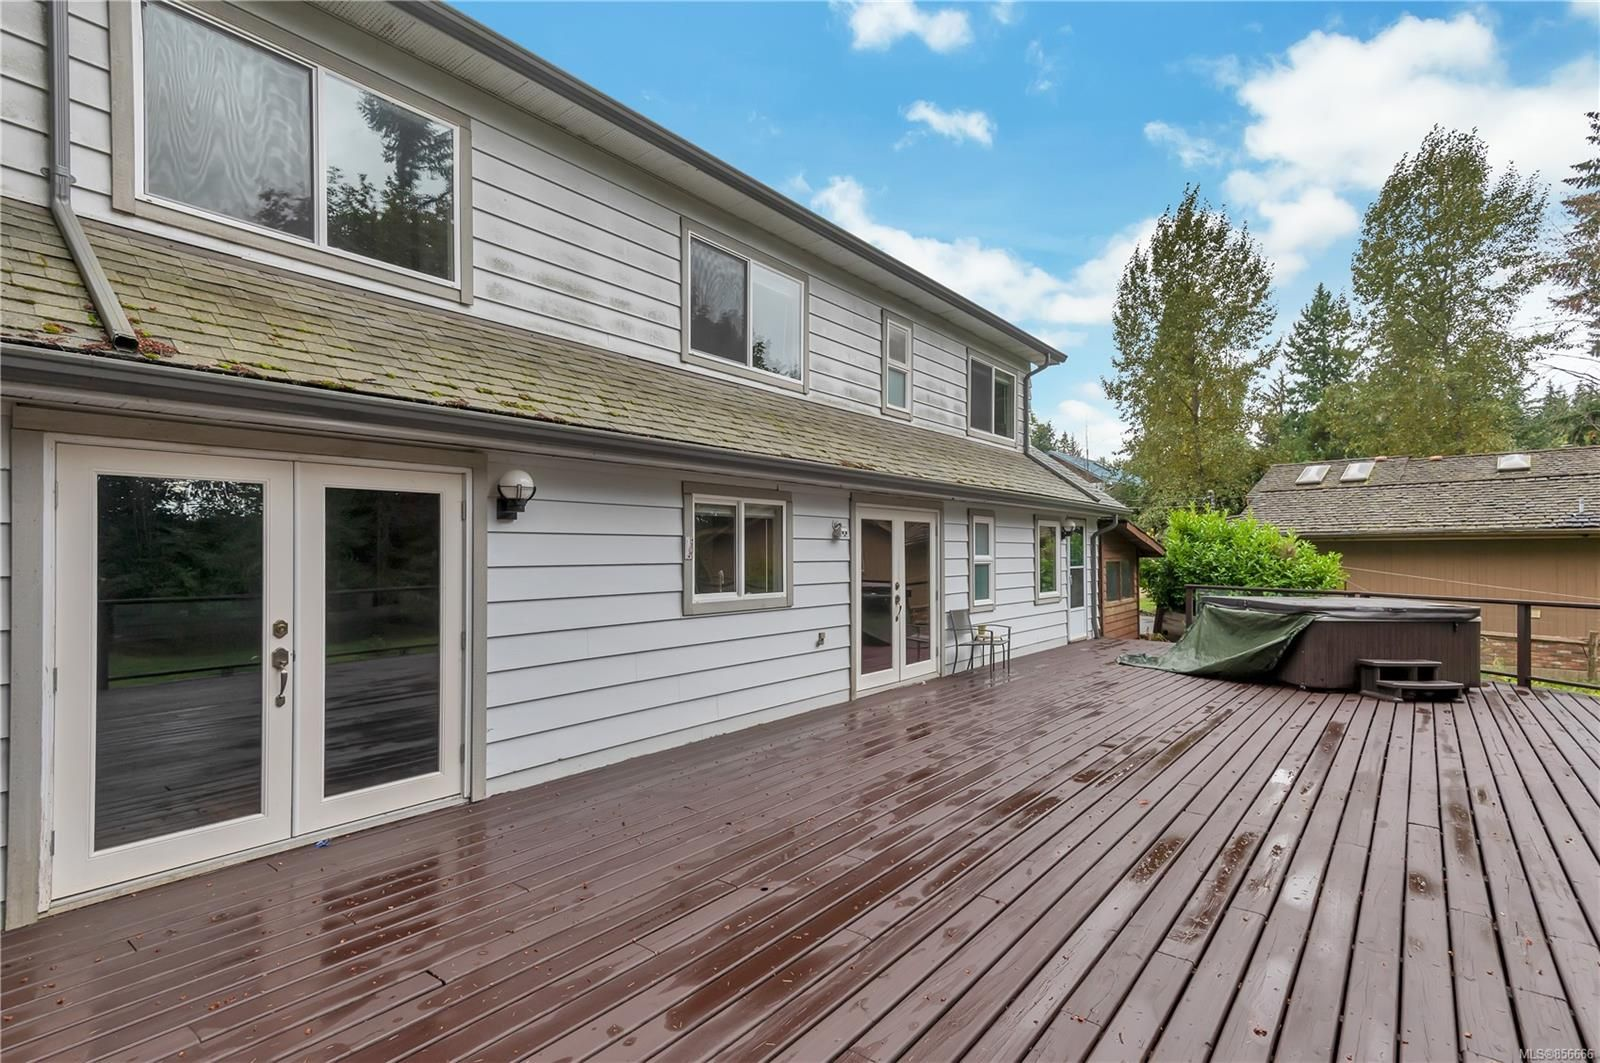 Photo 40: Photos: 2468 Oakes Rd in : CV Merville Black Creek House for sale (Comox Valley)  : MLS®# 856666